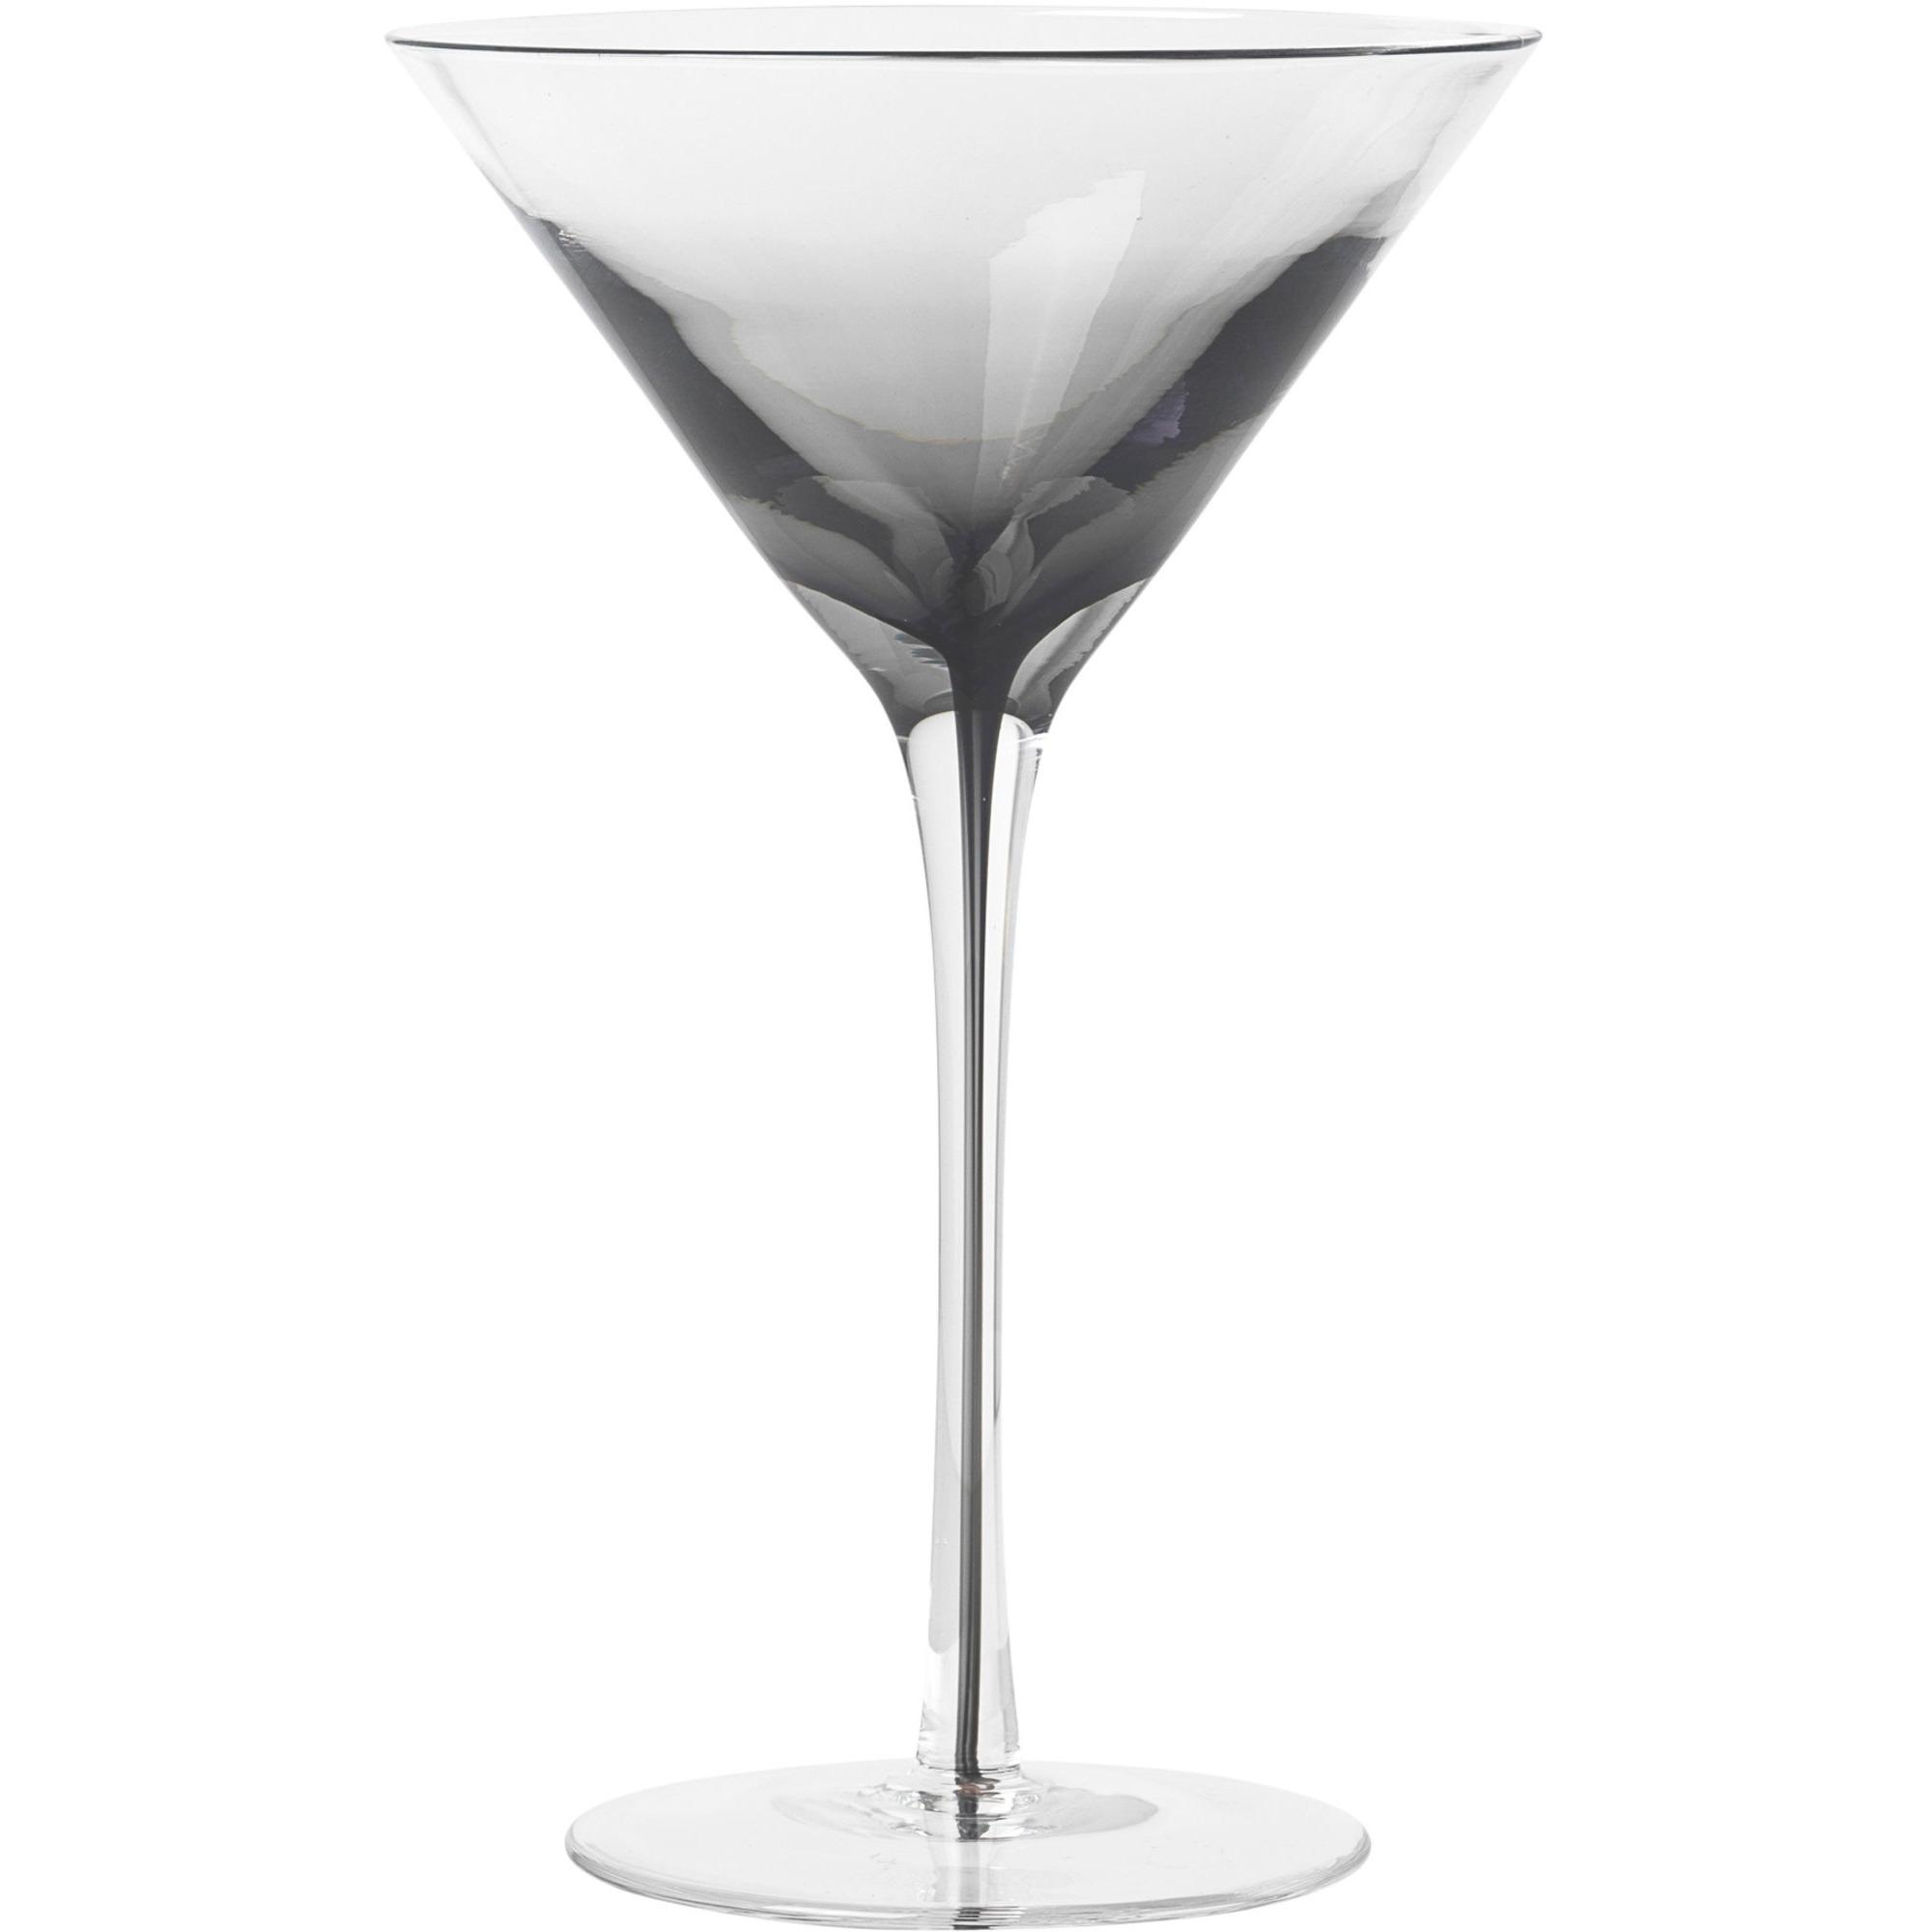 Broste Copenhagen 'Smoke' Munblåst martiniglas